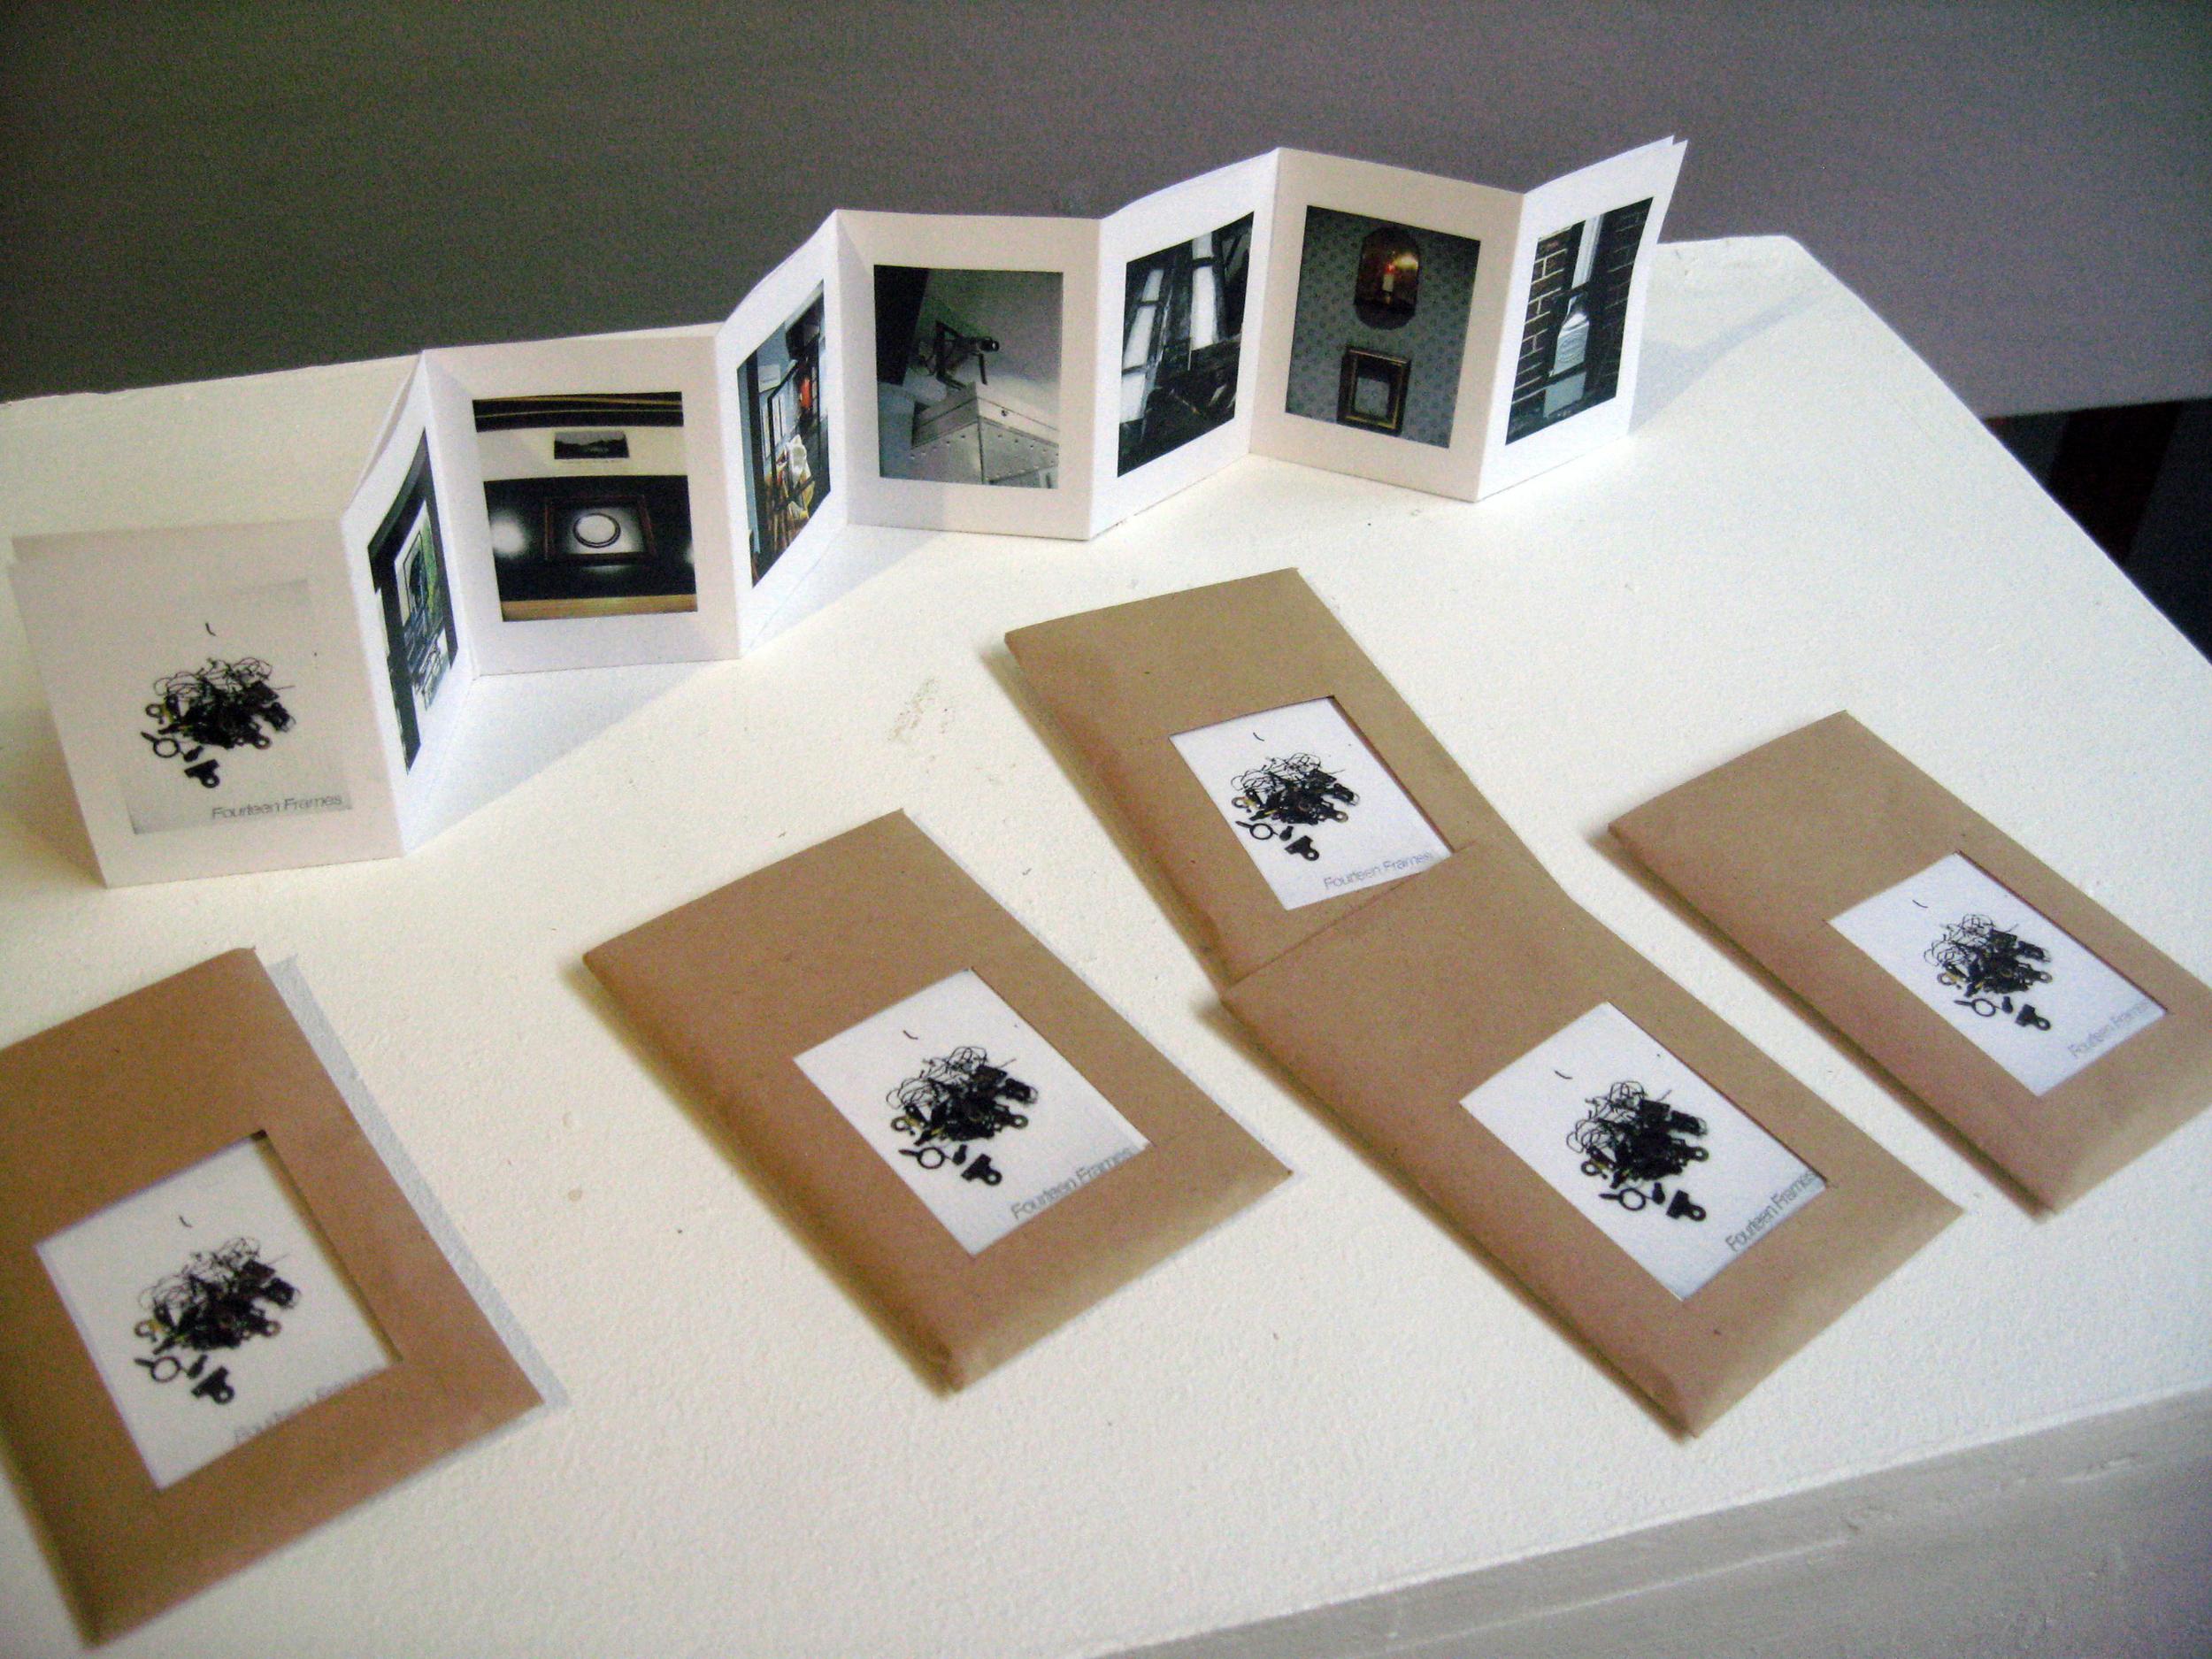 hurry slowly, fourteen frames booklet